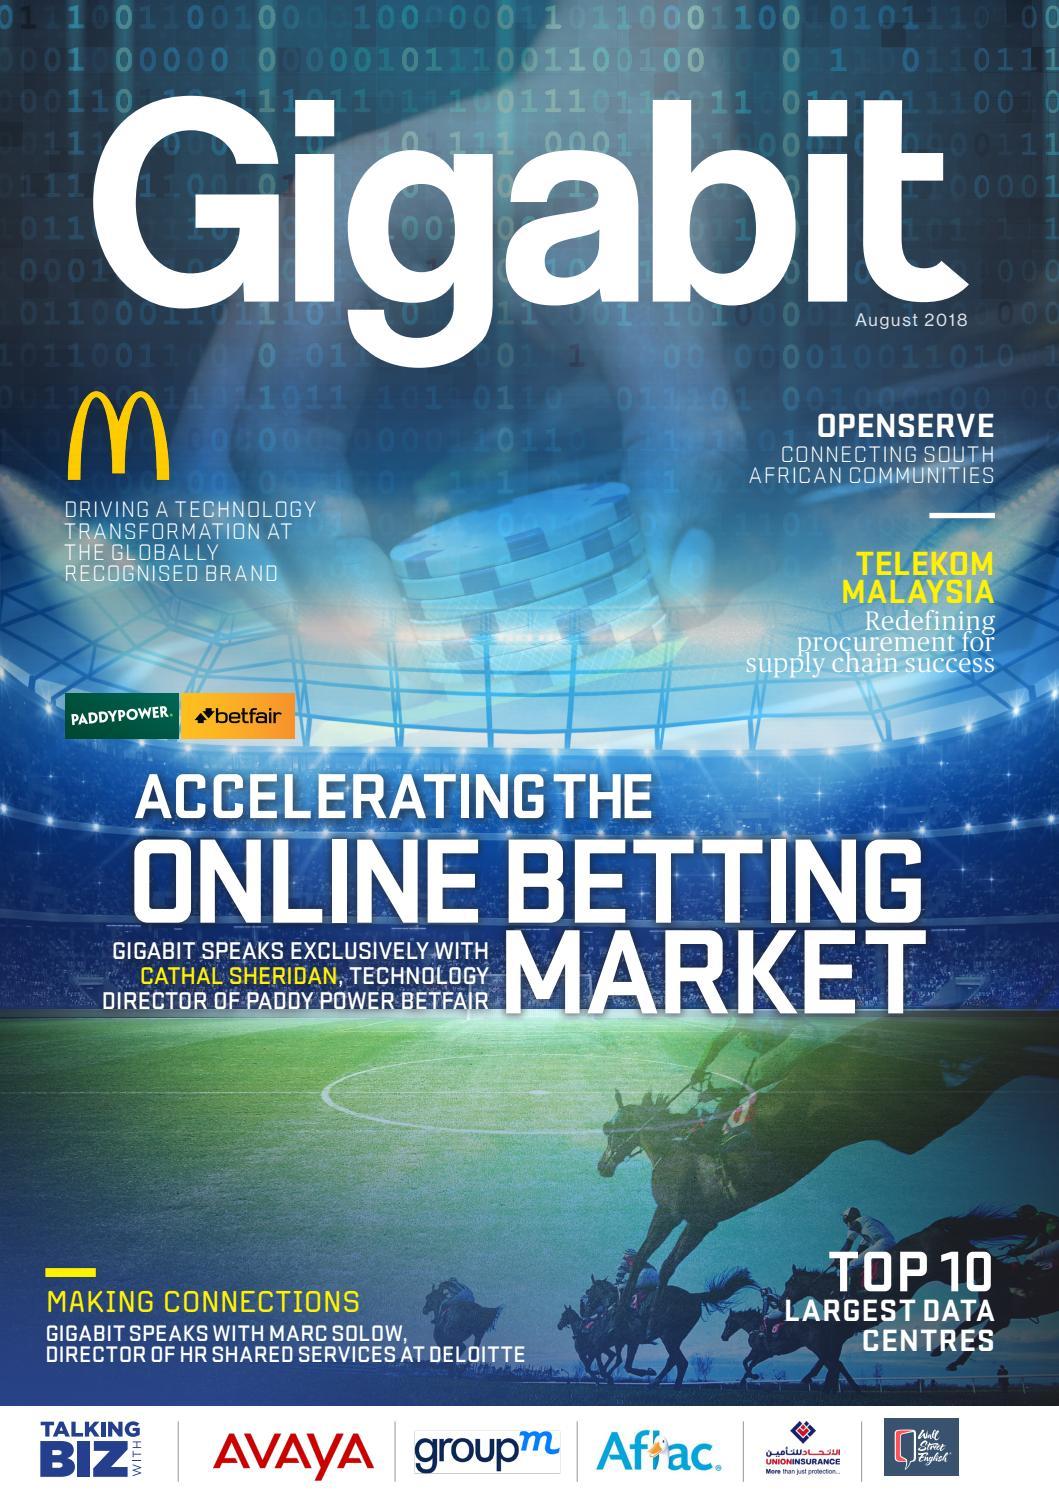 Gigabit Magazine — August 2018 by Gigabit - issuu